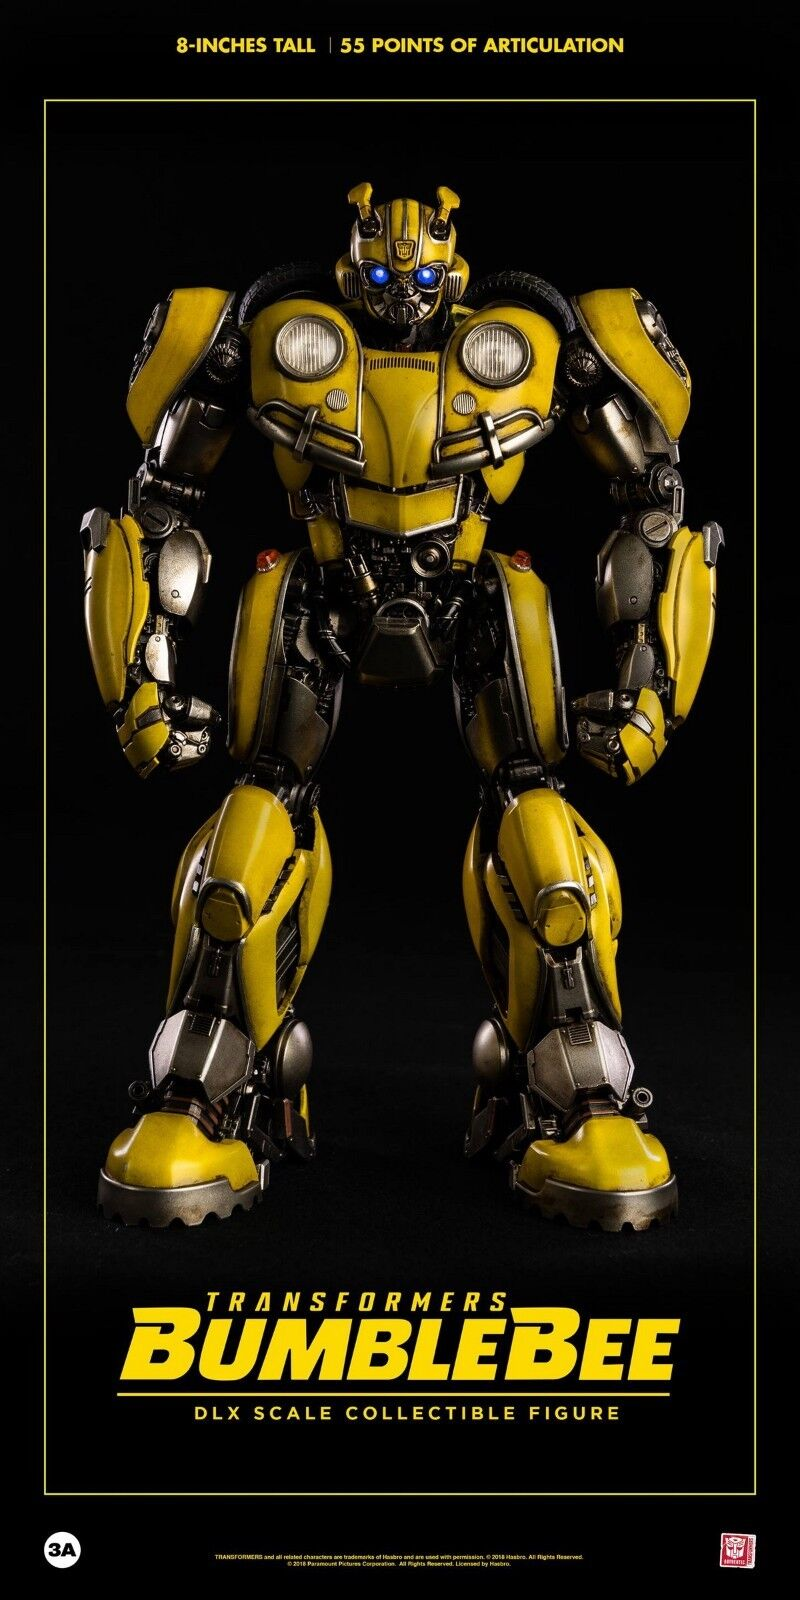 HASBRO X threeA Toys TRANSFORMERS Bumblebee DLX scale 8  Action Figure